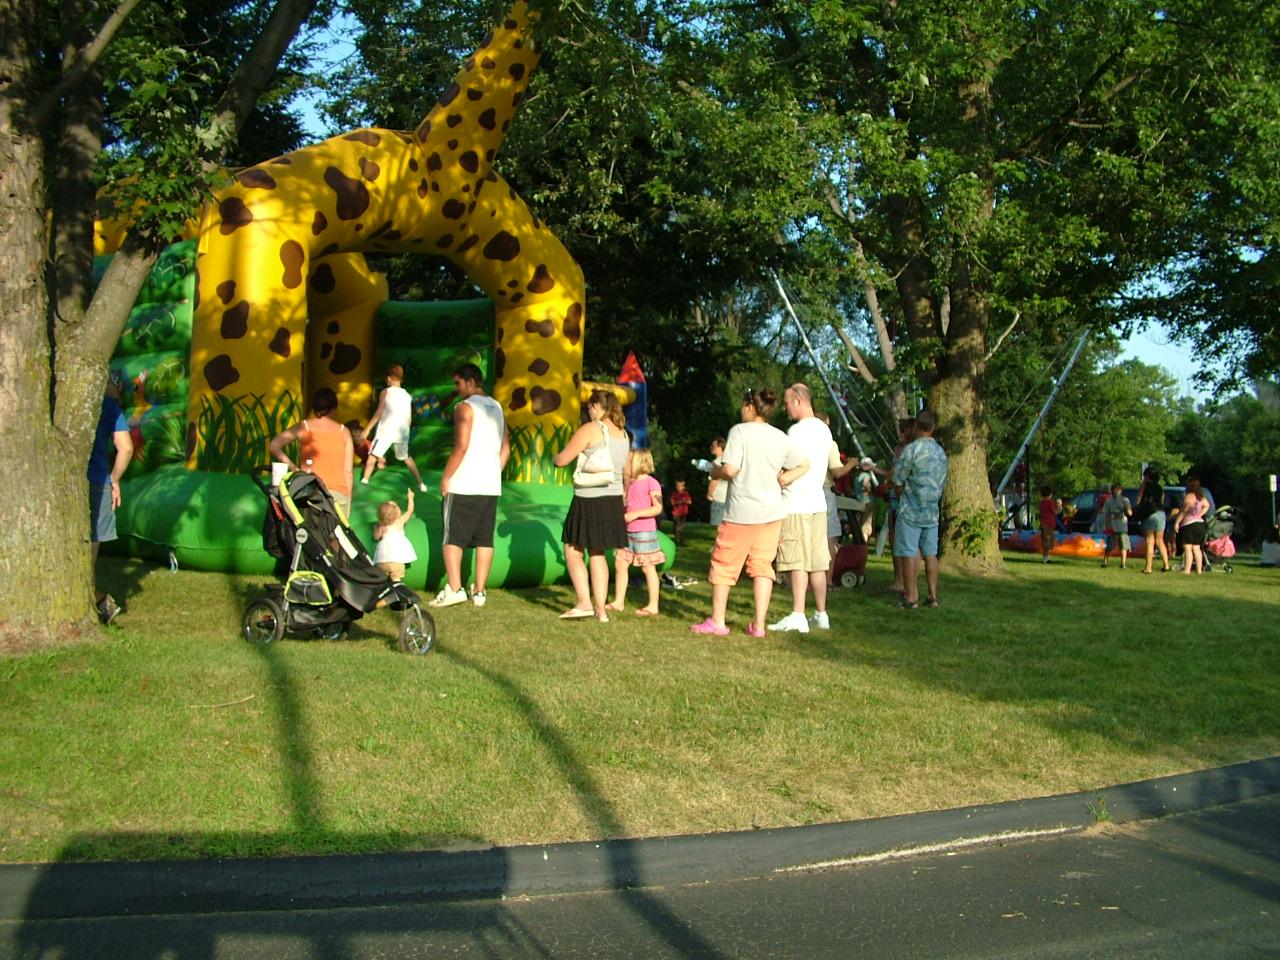 2010 Festival Childrens Rides